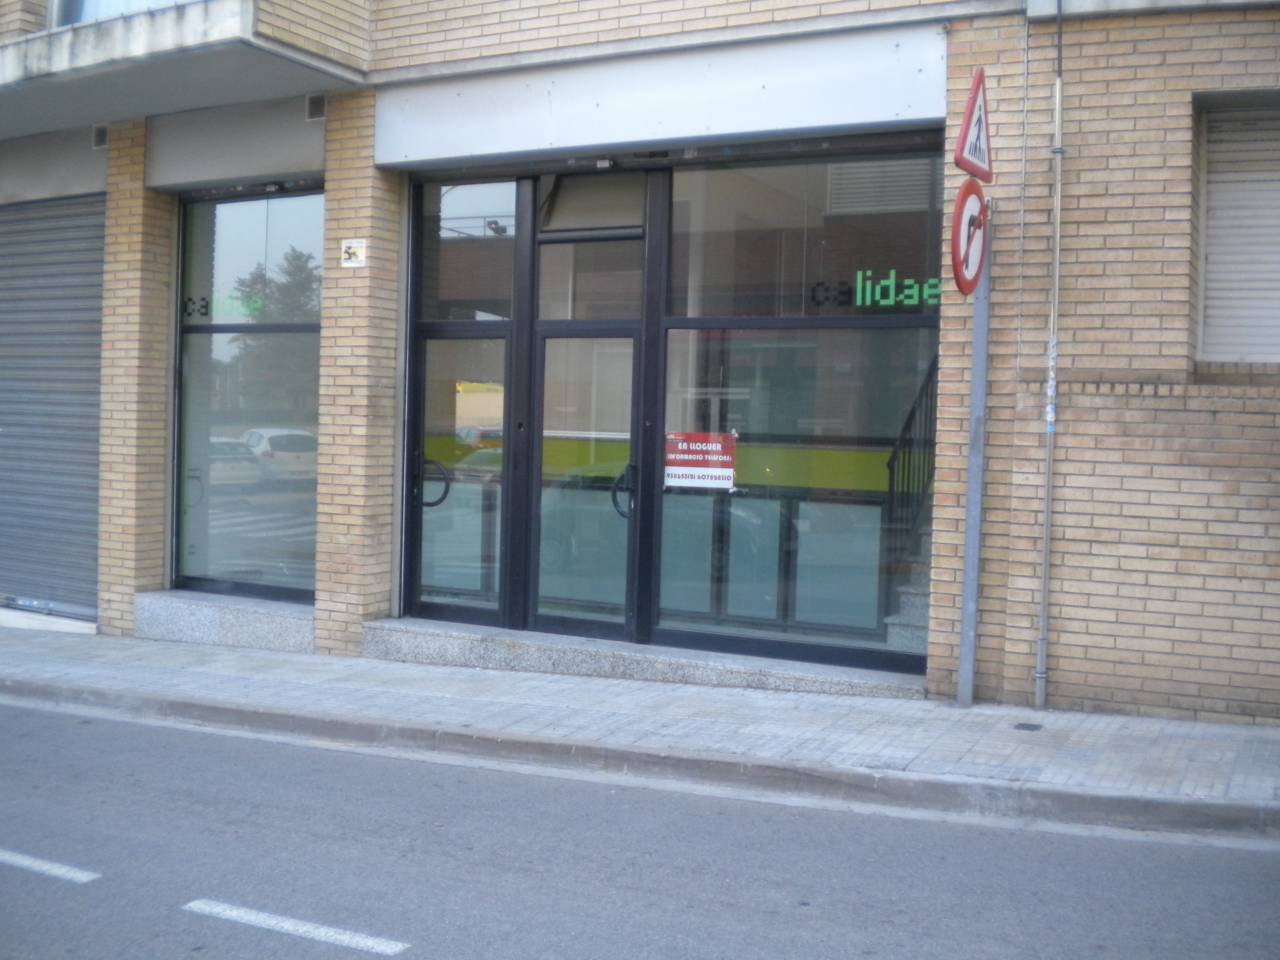 Lloguer Local Comercial  L´ametller. Superf. 140 m²,  2 aseos, salida de humos, escaparate, planta ba